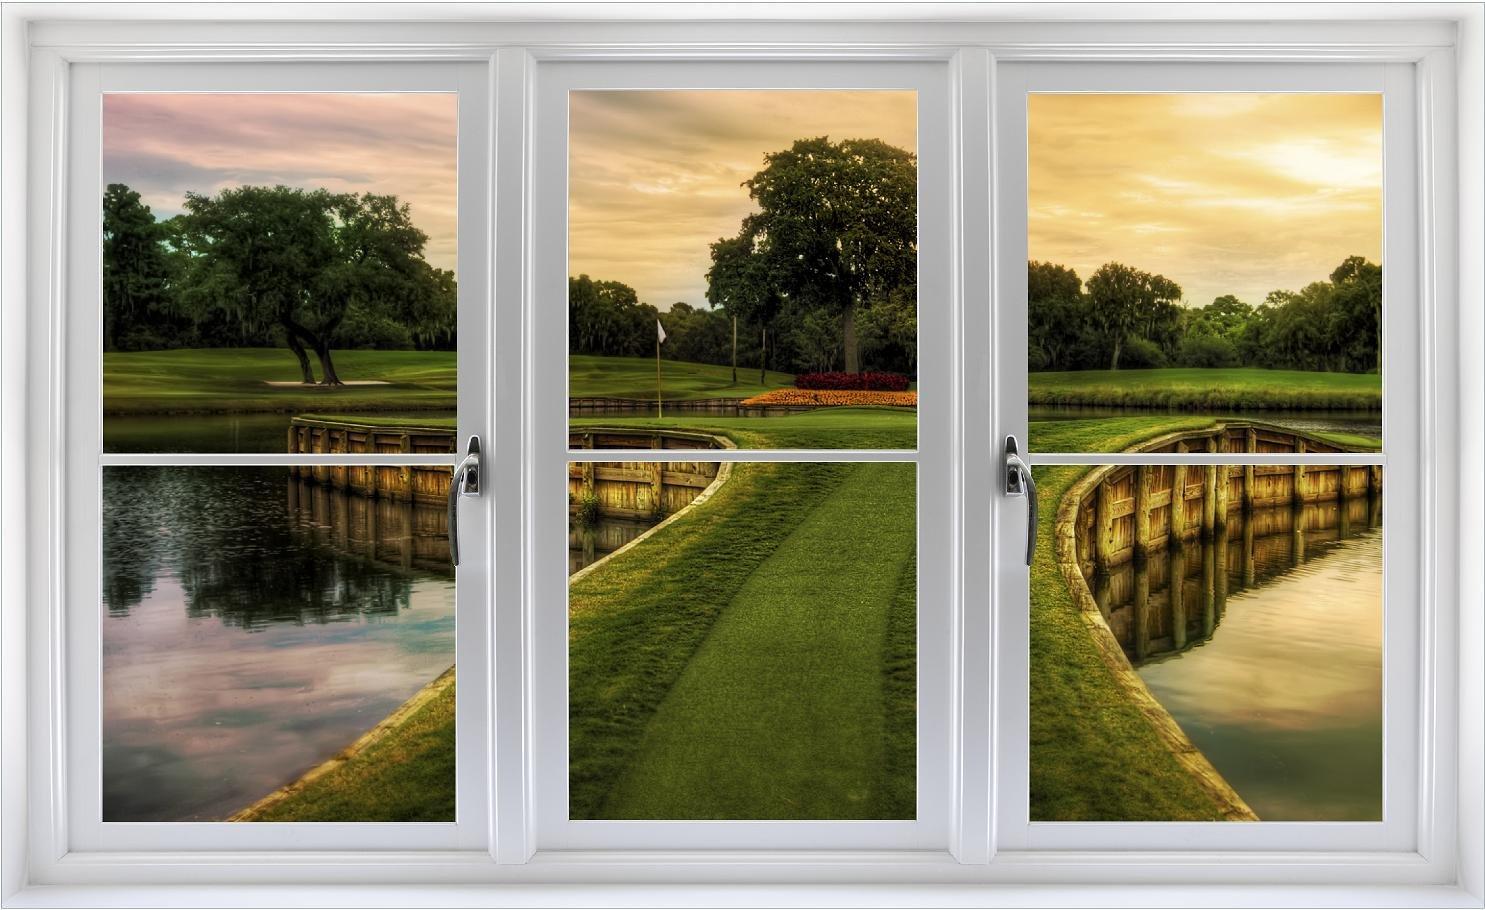 24'' Golf Course Window Decal Hole 17 TPC Sawgrass WindowScape PGA Florida Wall Graphic Decal Sticker Home Kids Game Room Mural Art Decor NEW